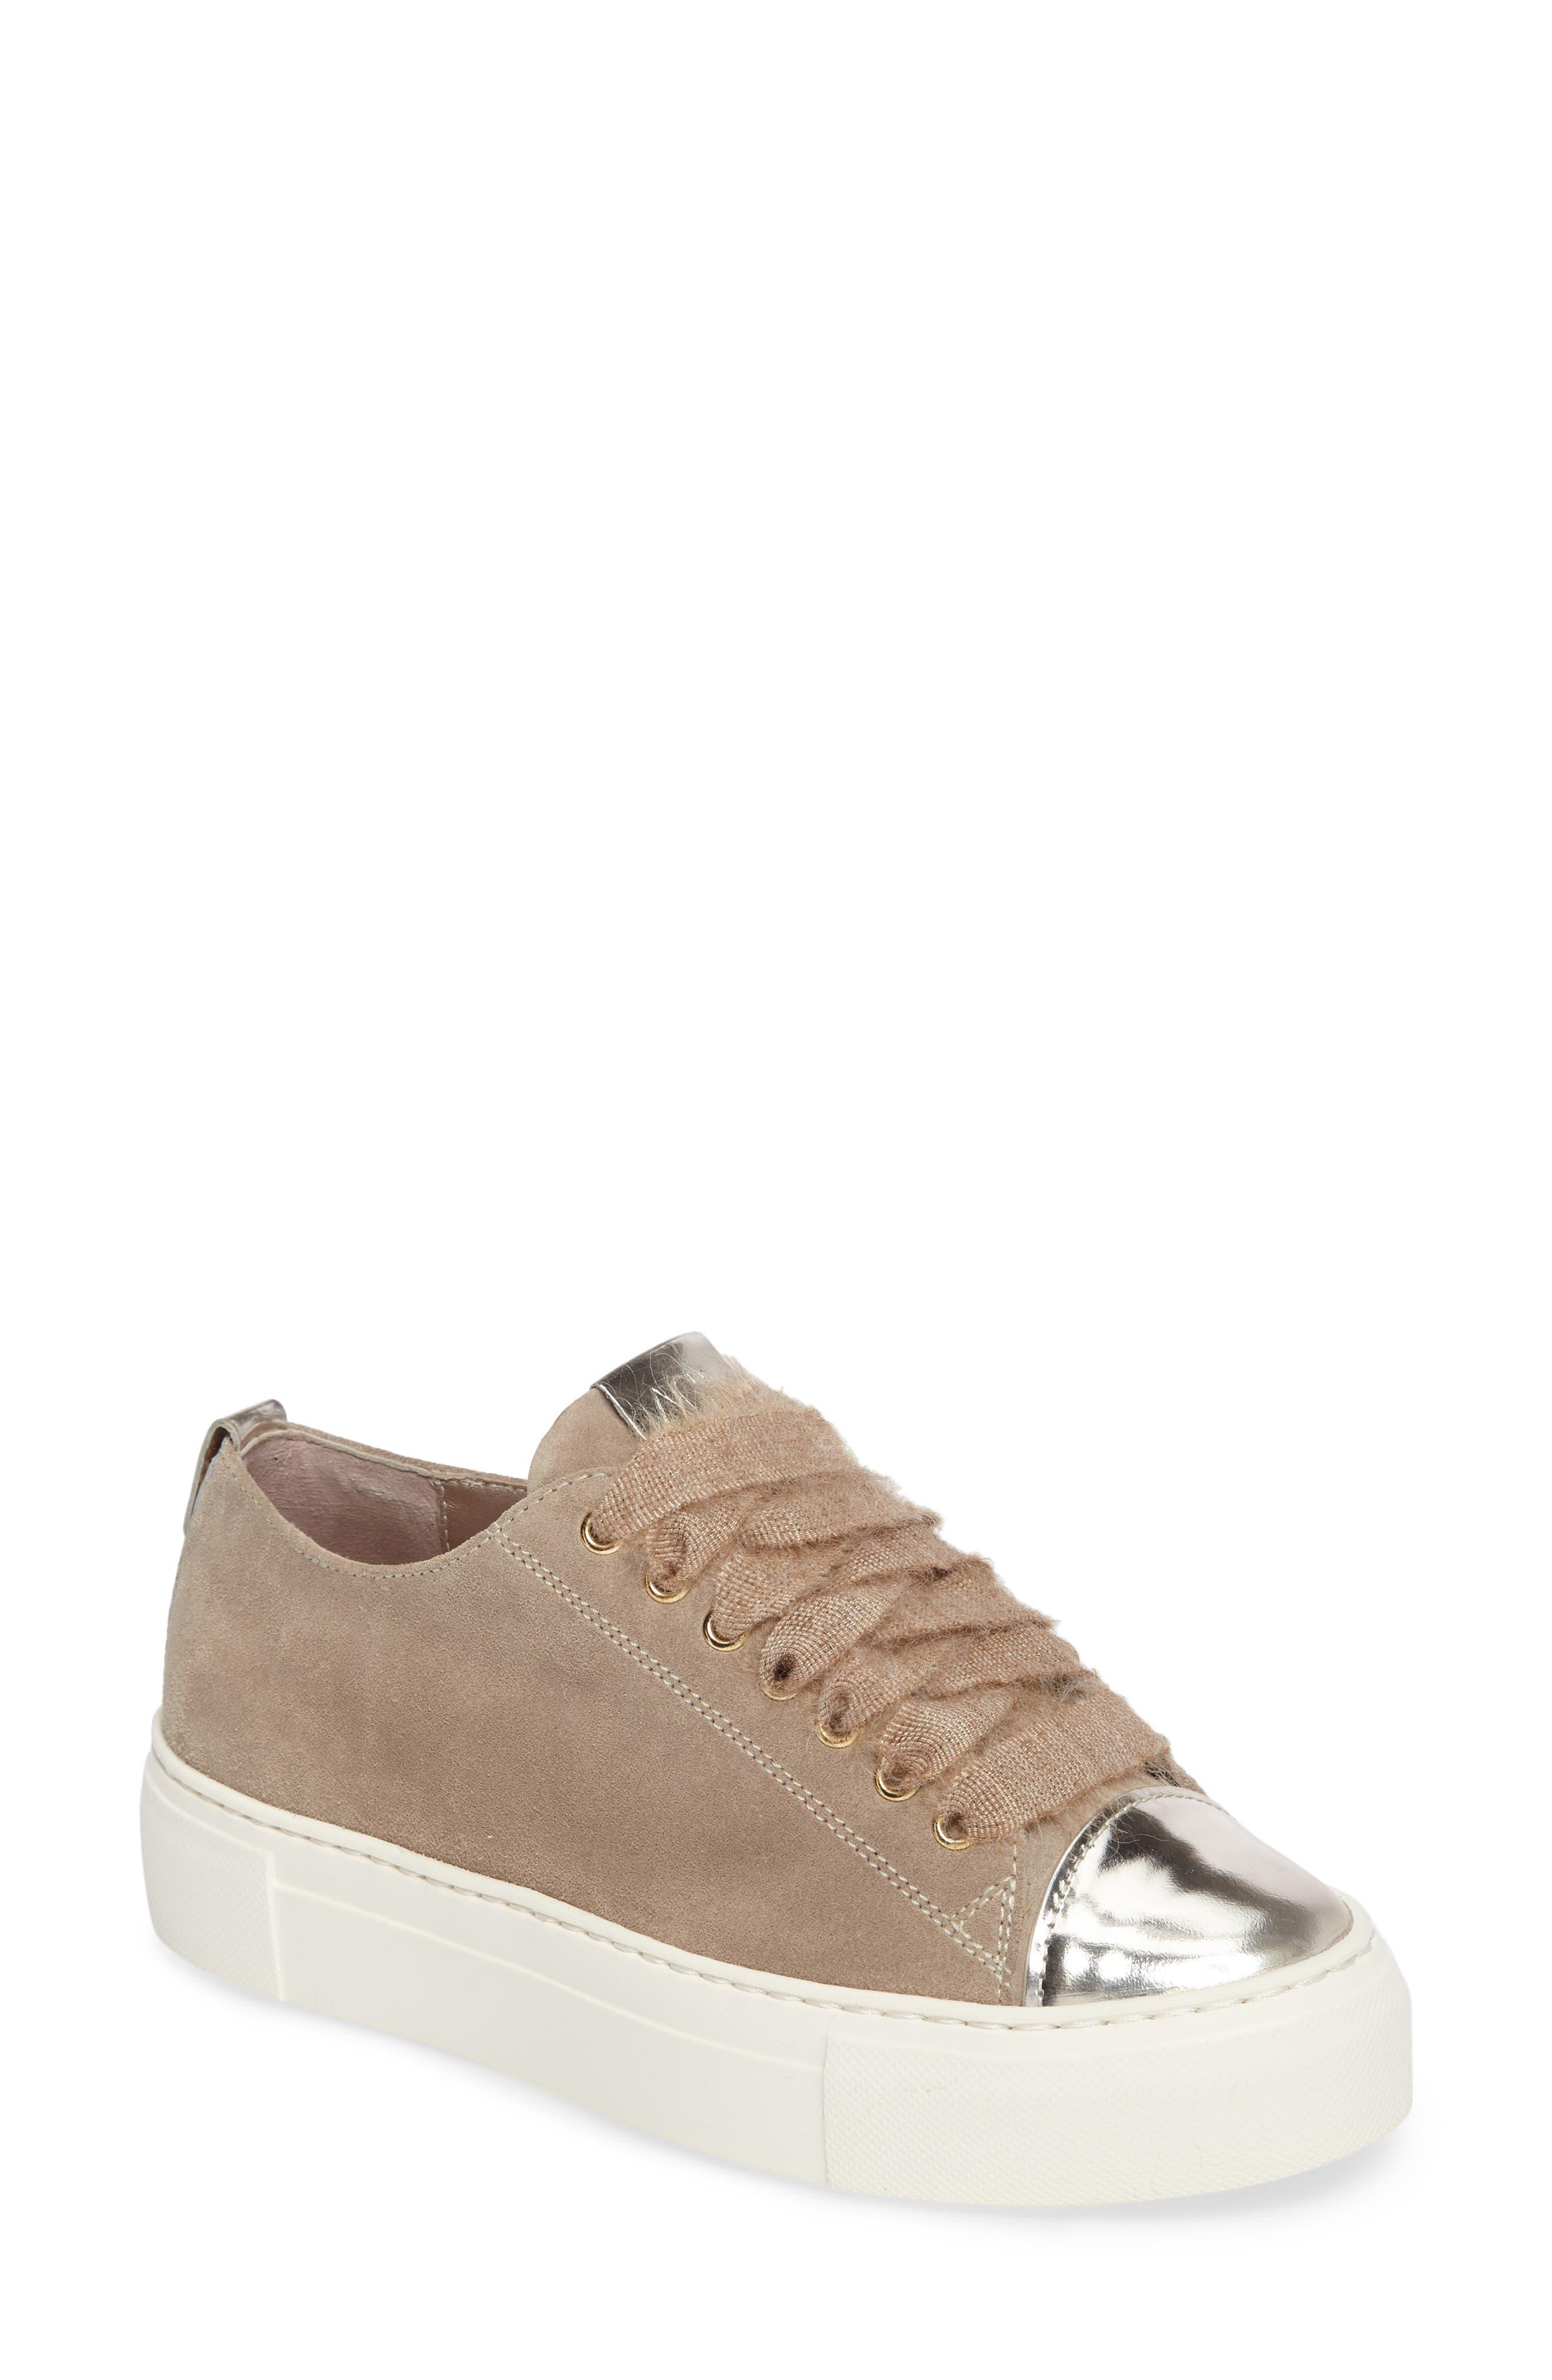 Main Image - AGL Cap Toe Platform Sneaker (Women)